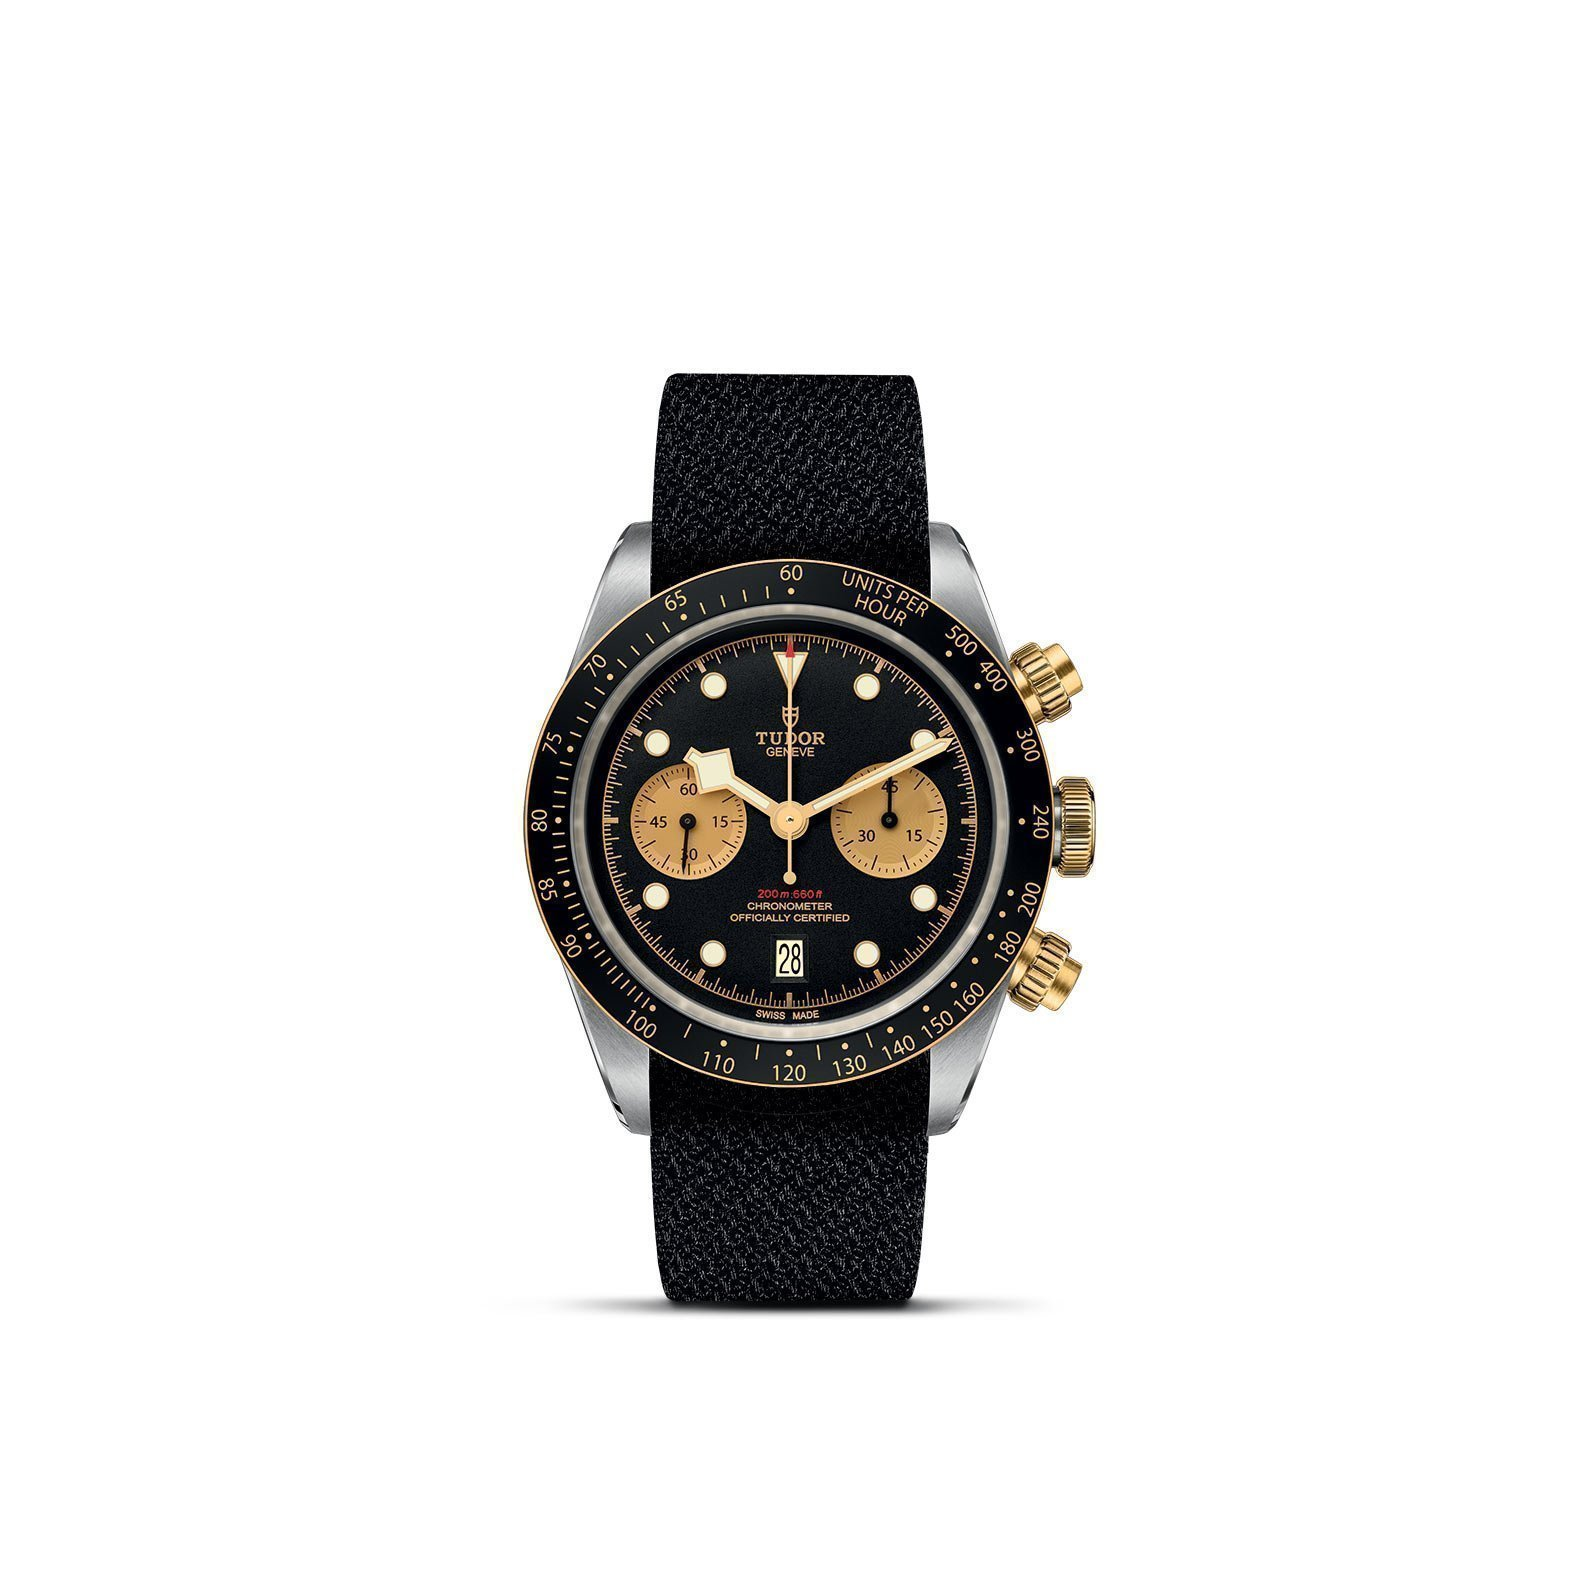 Montre TUDOR Black Bay Chrono S&G boîtier en acier, 41mm, bracelet en tissu vue 1